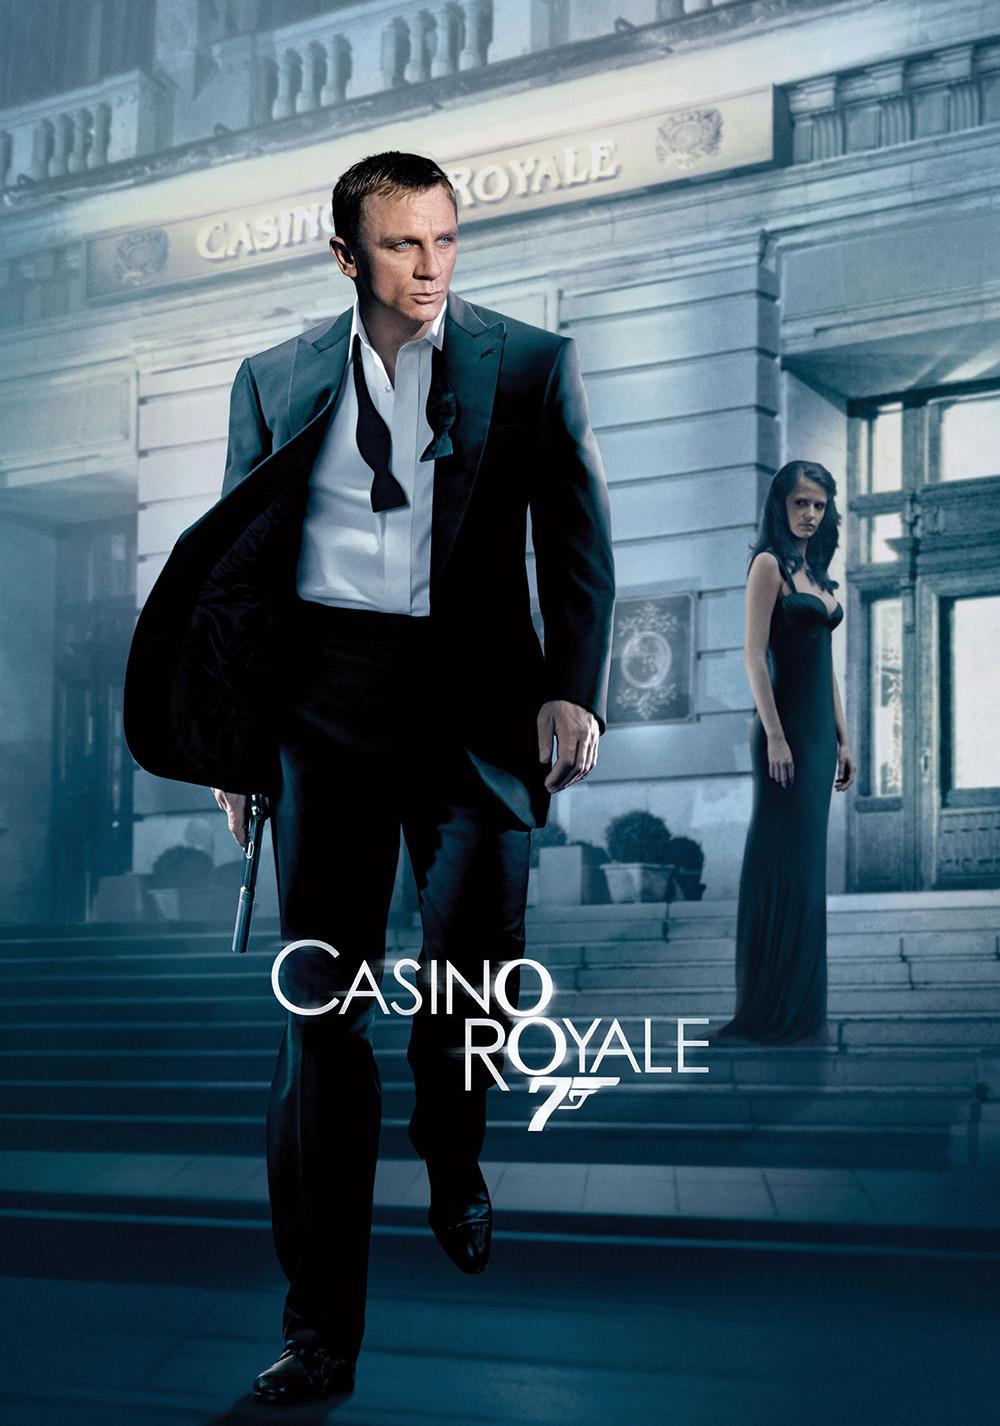 Casino royale irc greektown casino detroit address